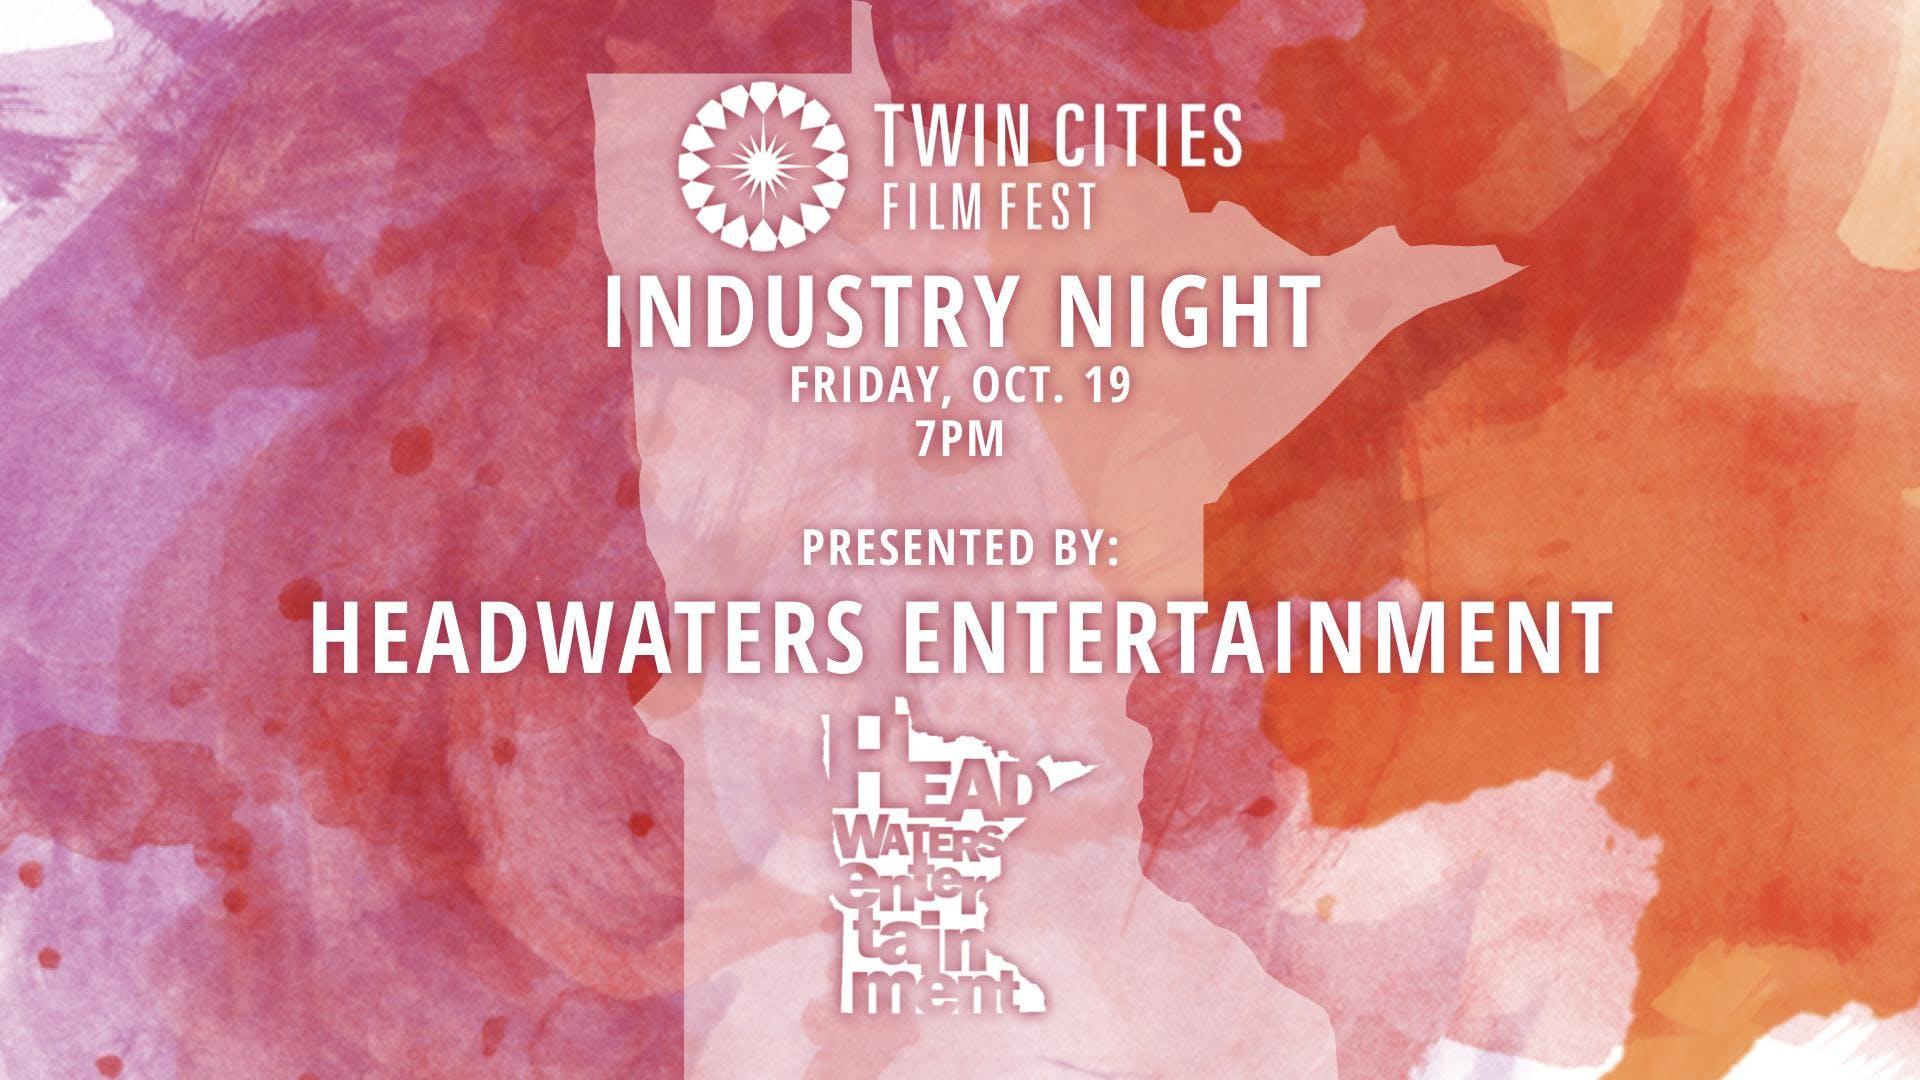 2018 Industry Night - Twin Cities Film Fest